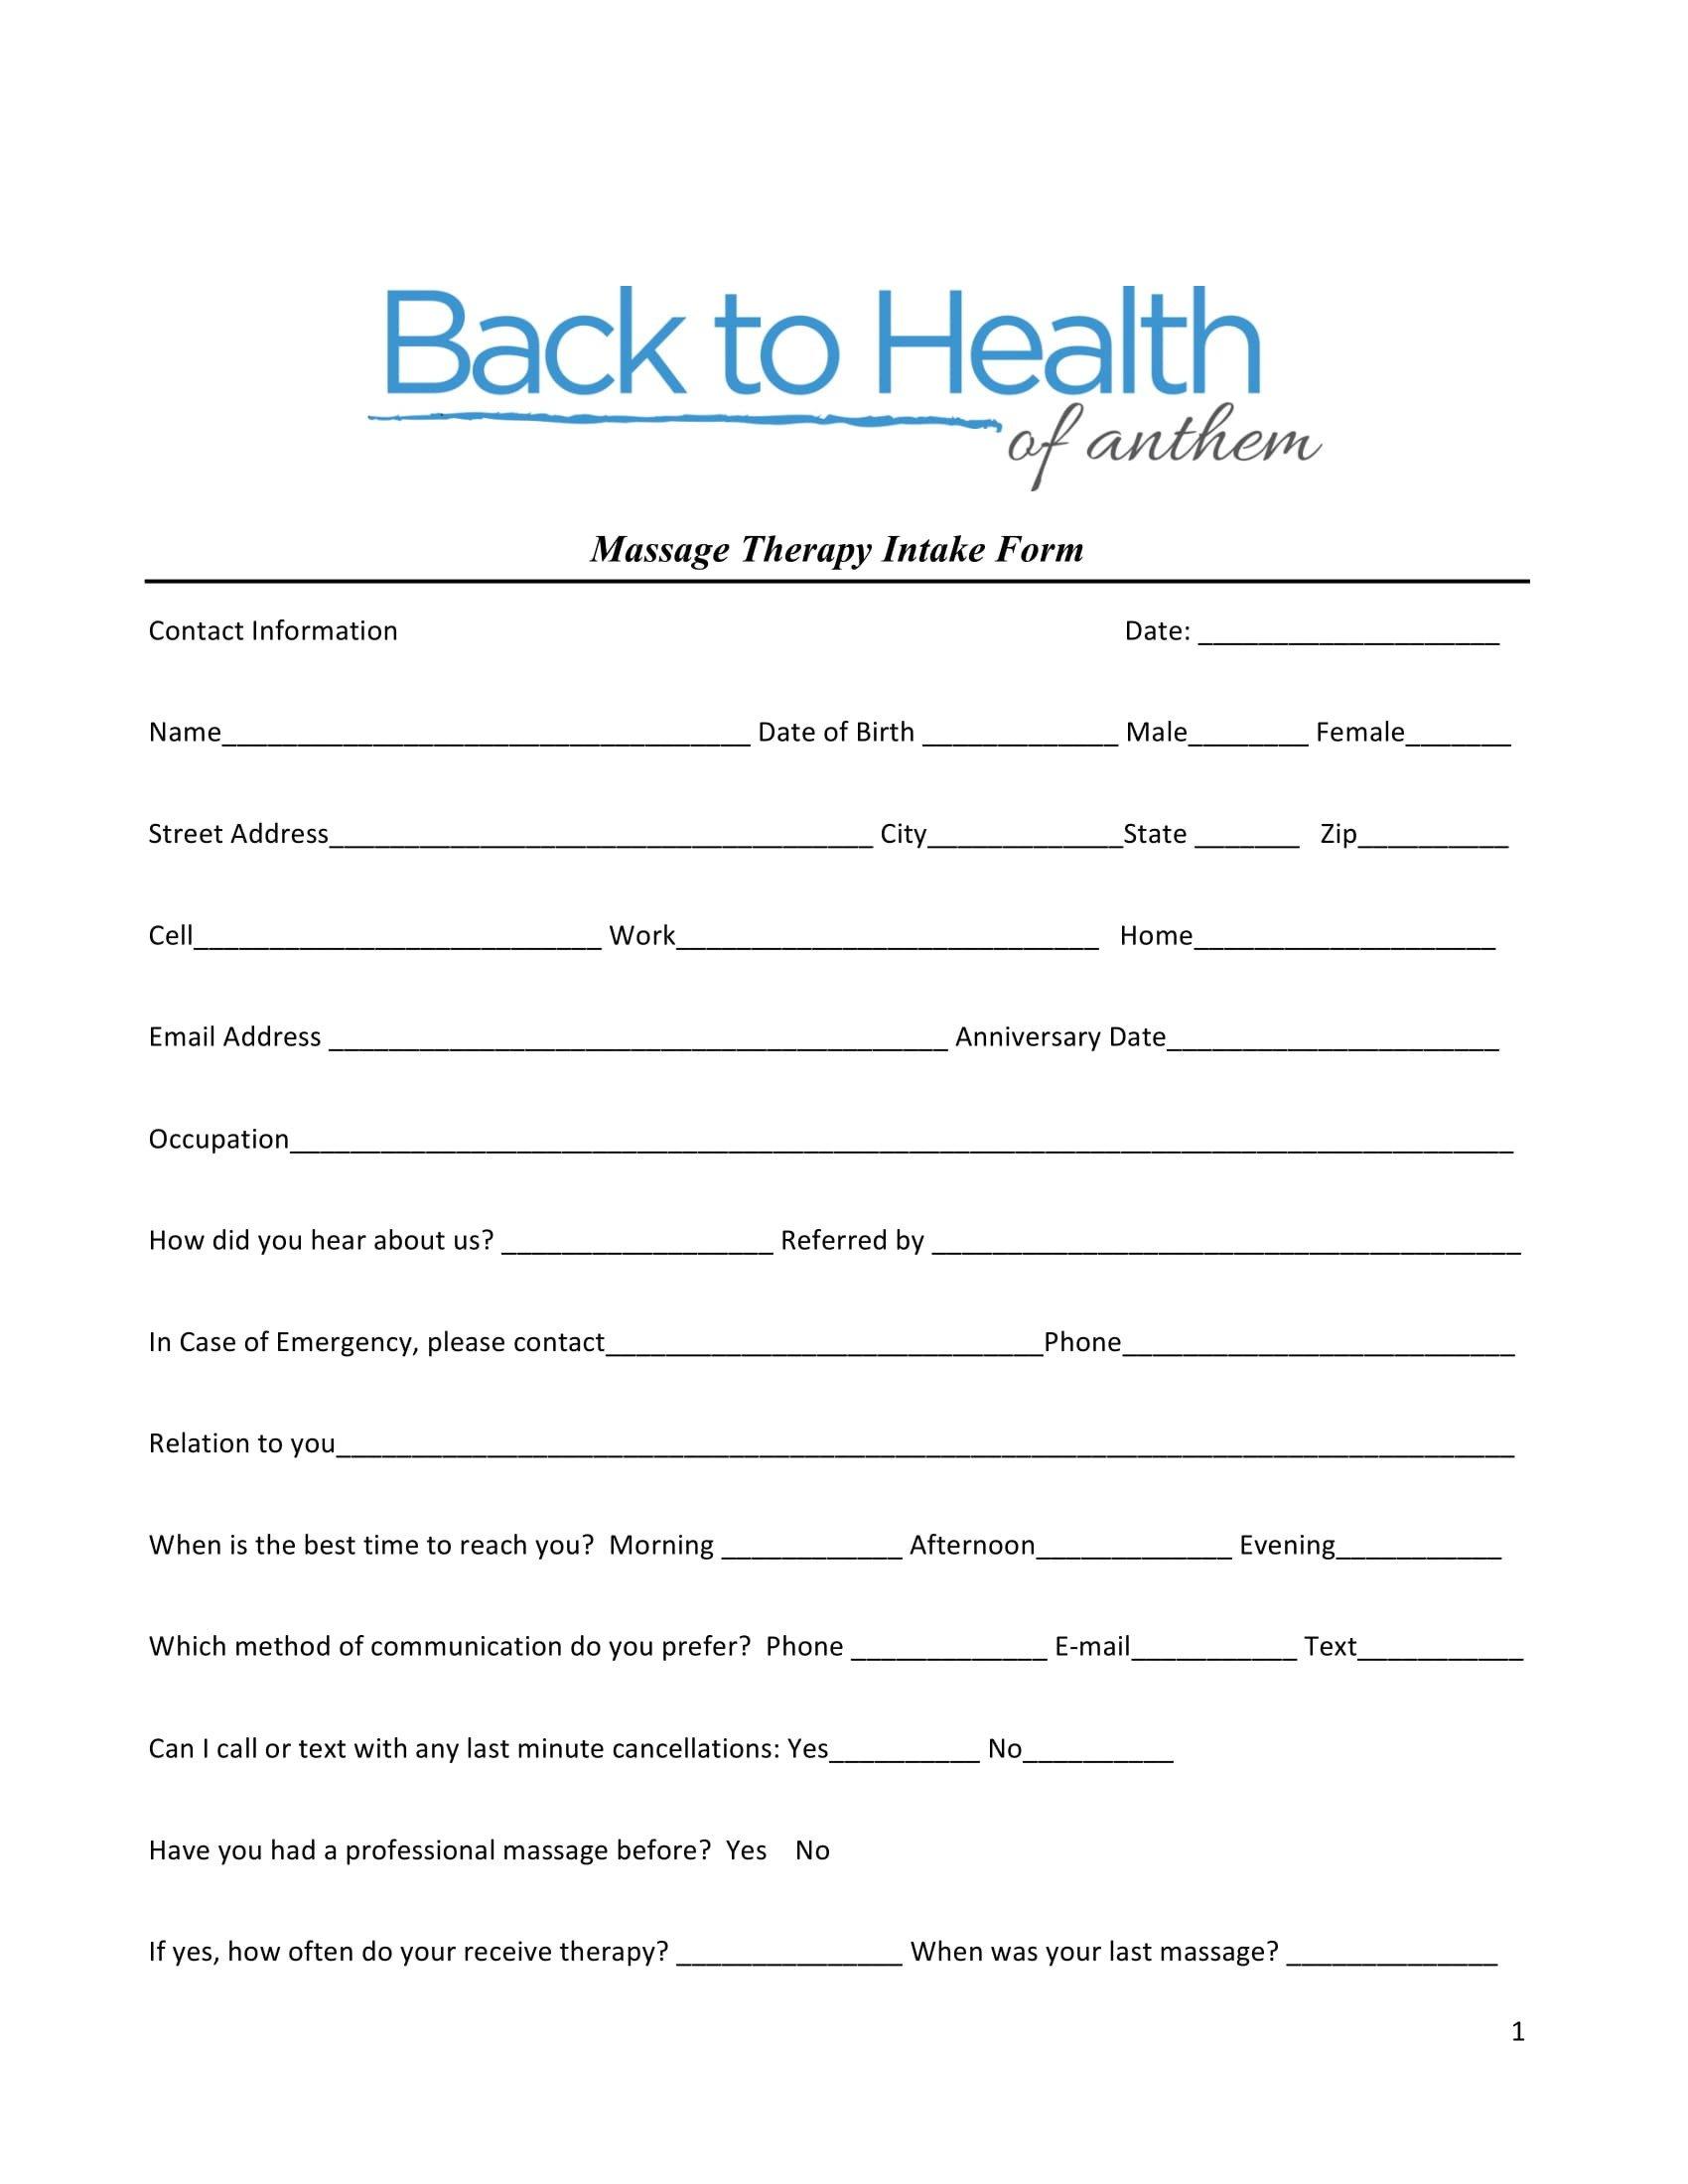 Simple Massage Intake form 5 Massage Intake forms Pdf